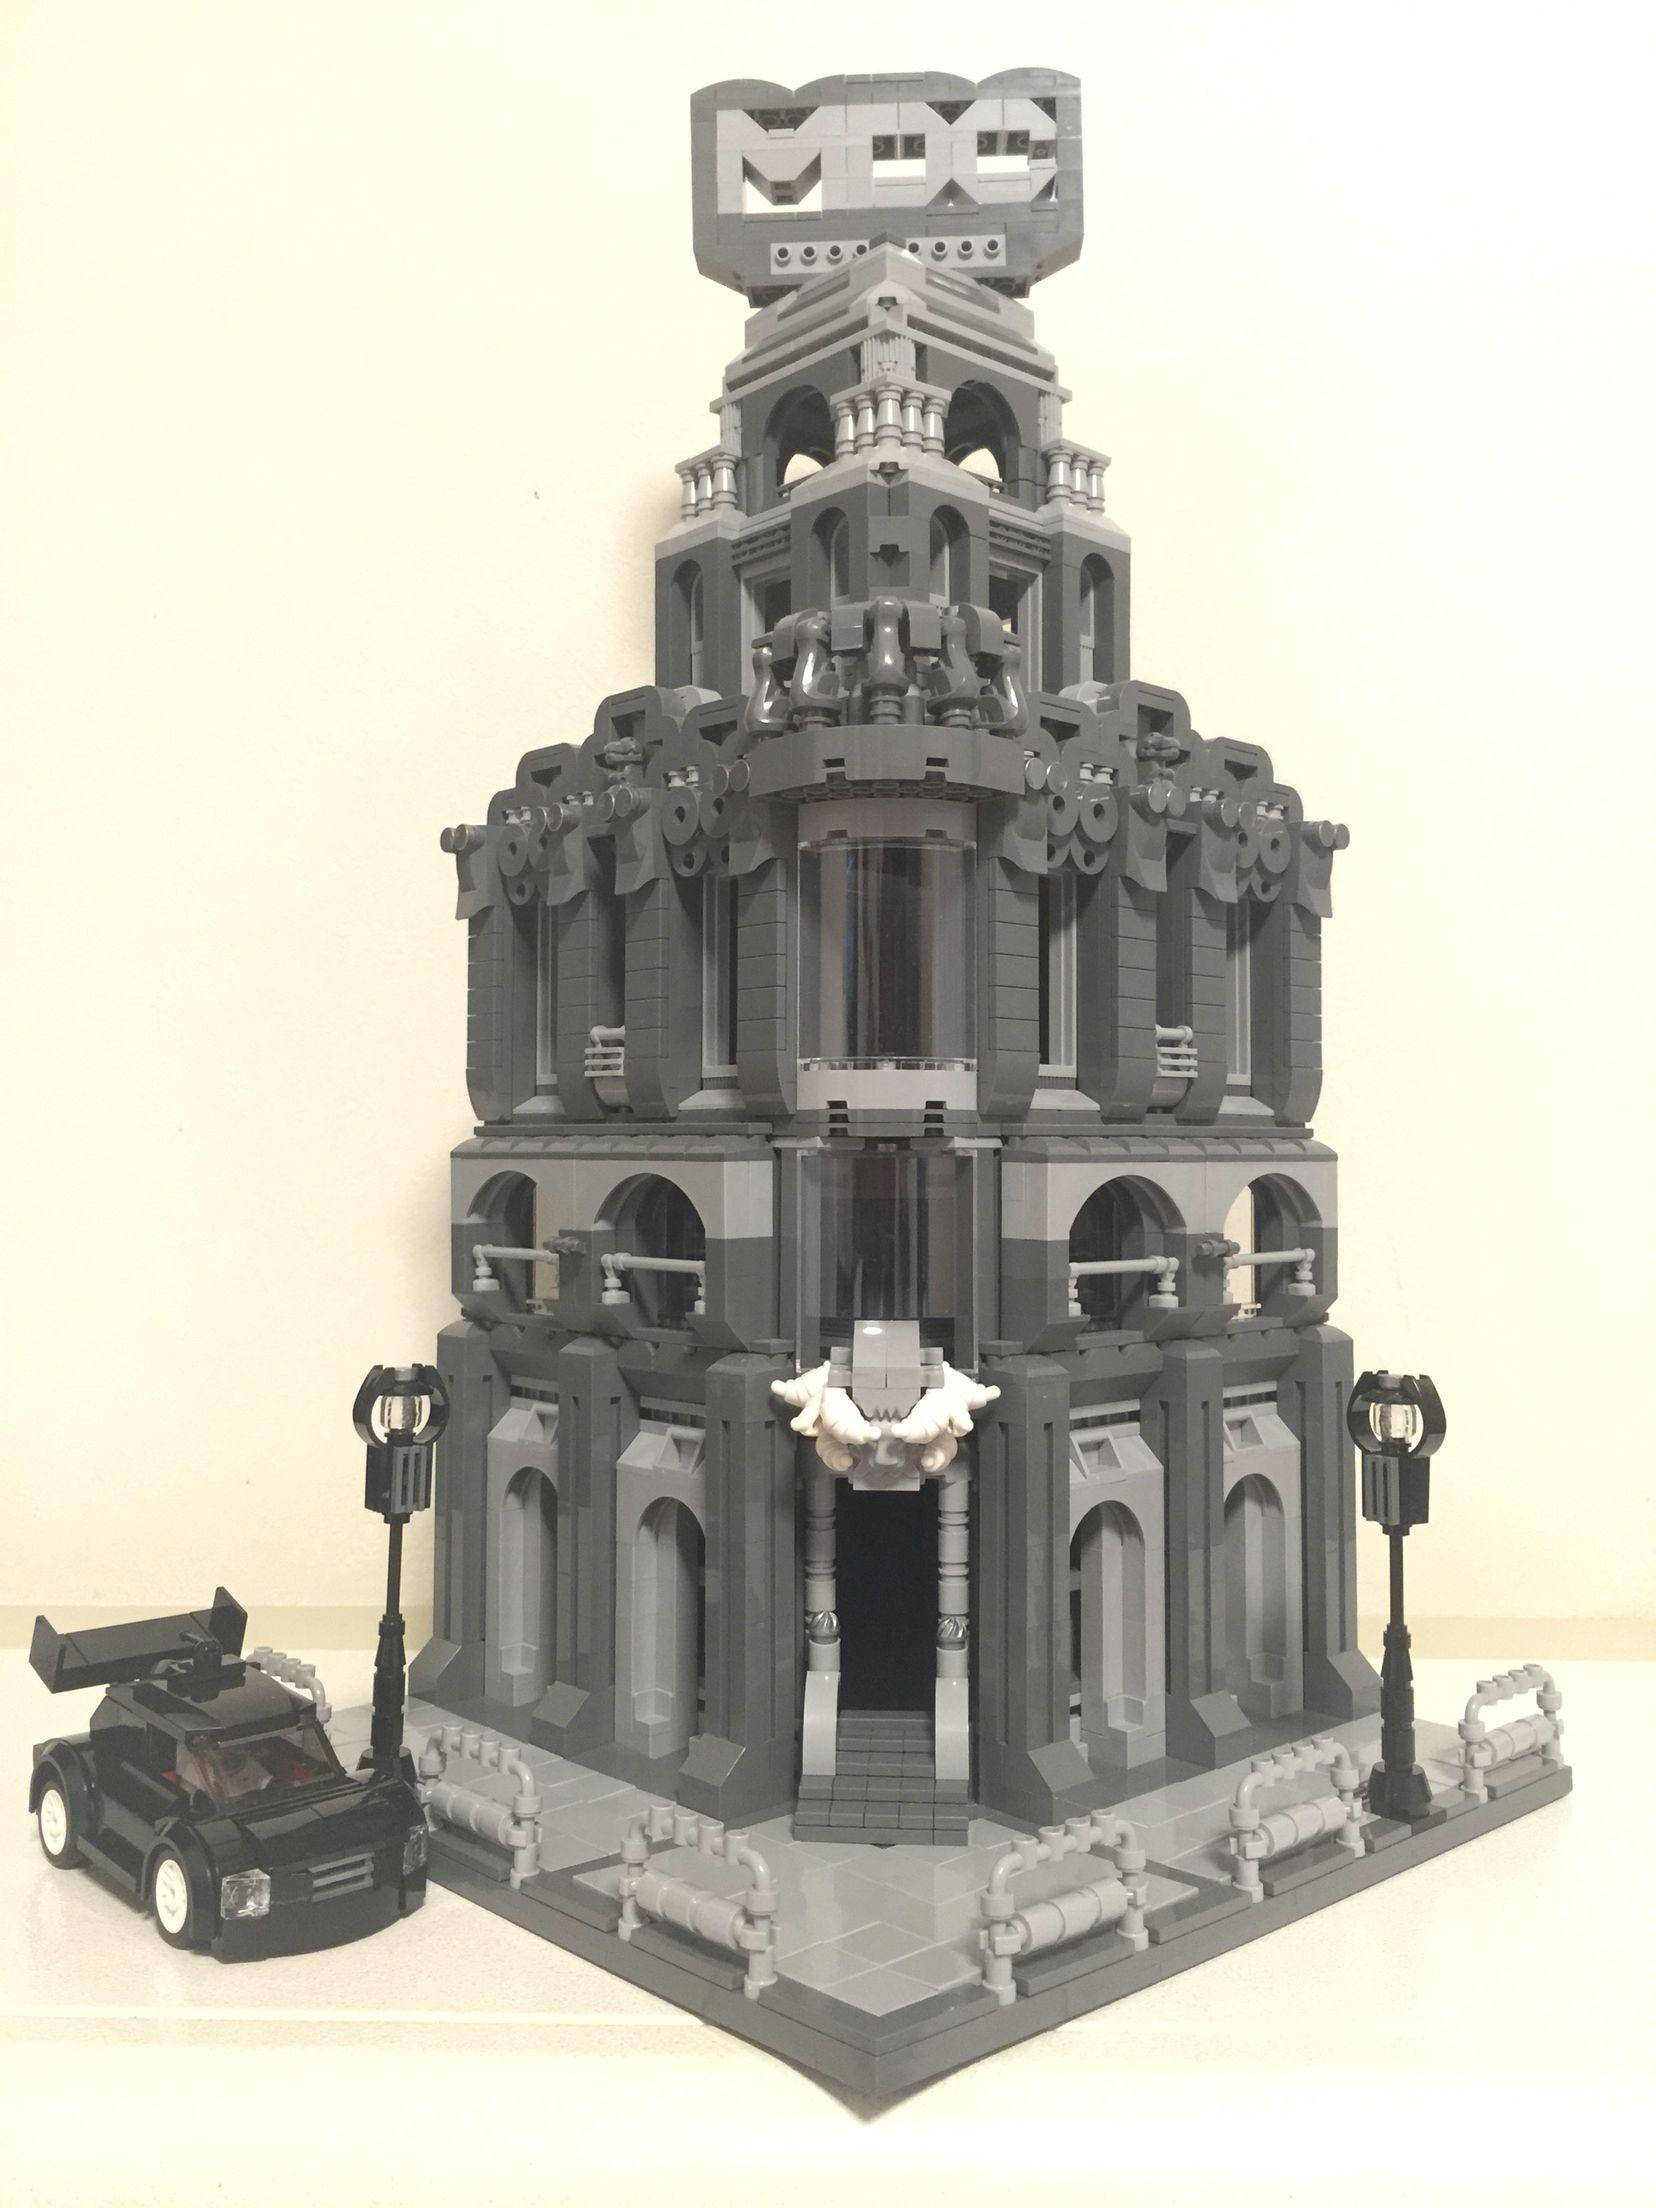 Mdc Building Lego By Mdc Lego Architecture Pinterest Lego